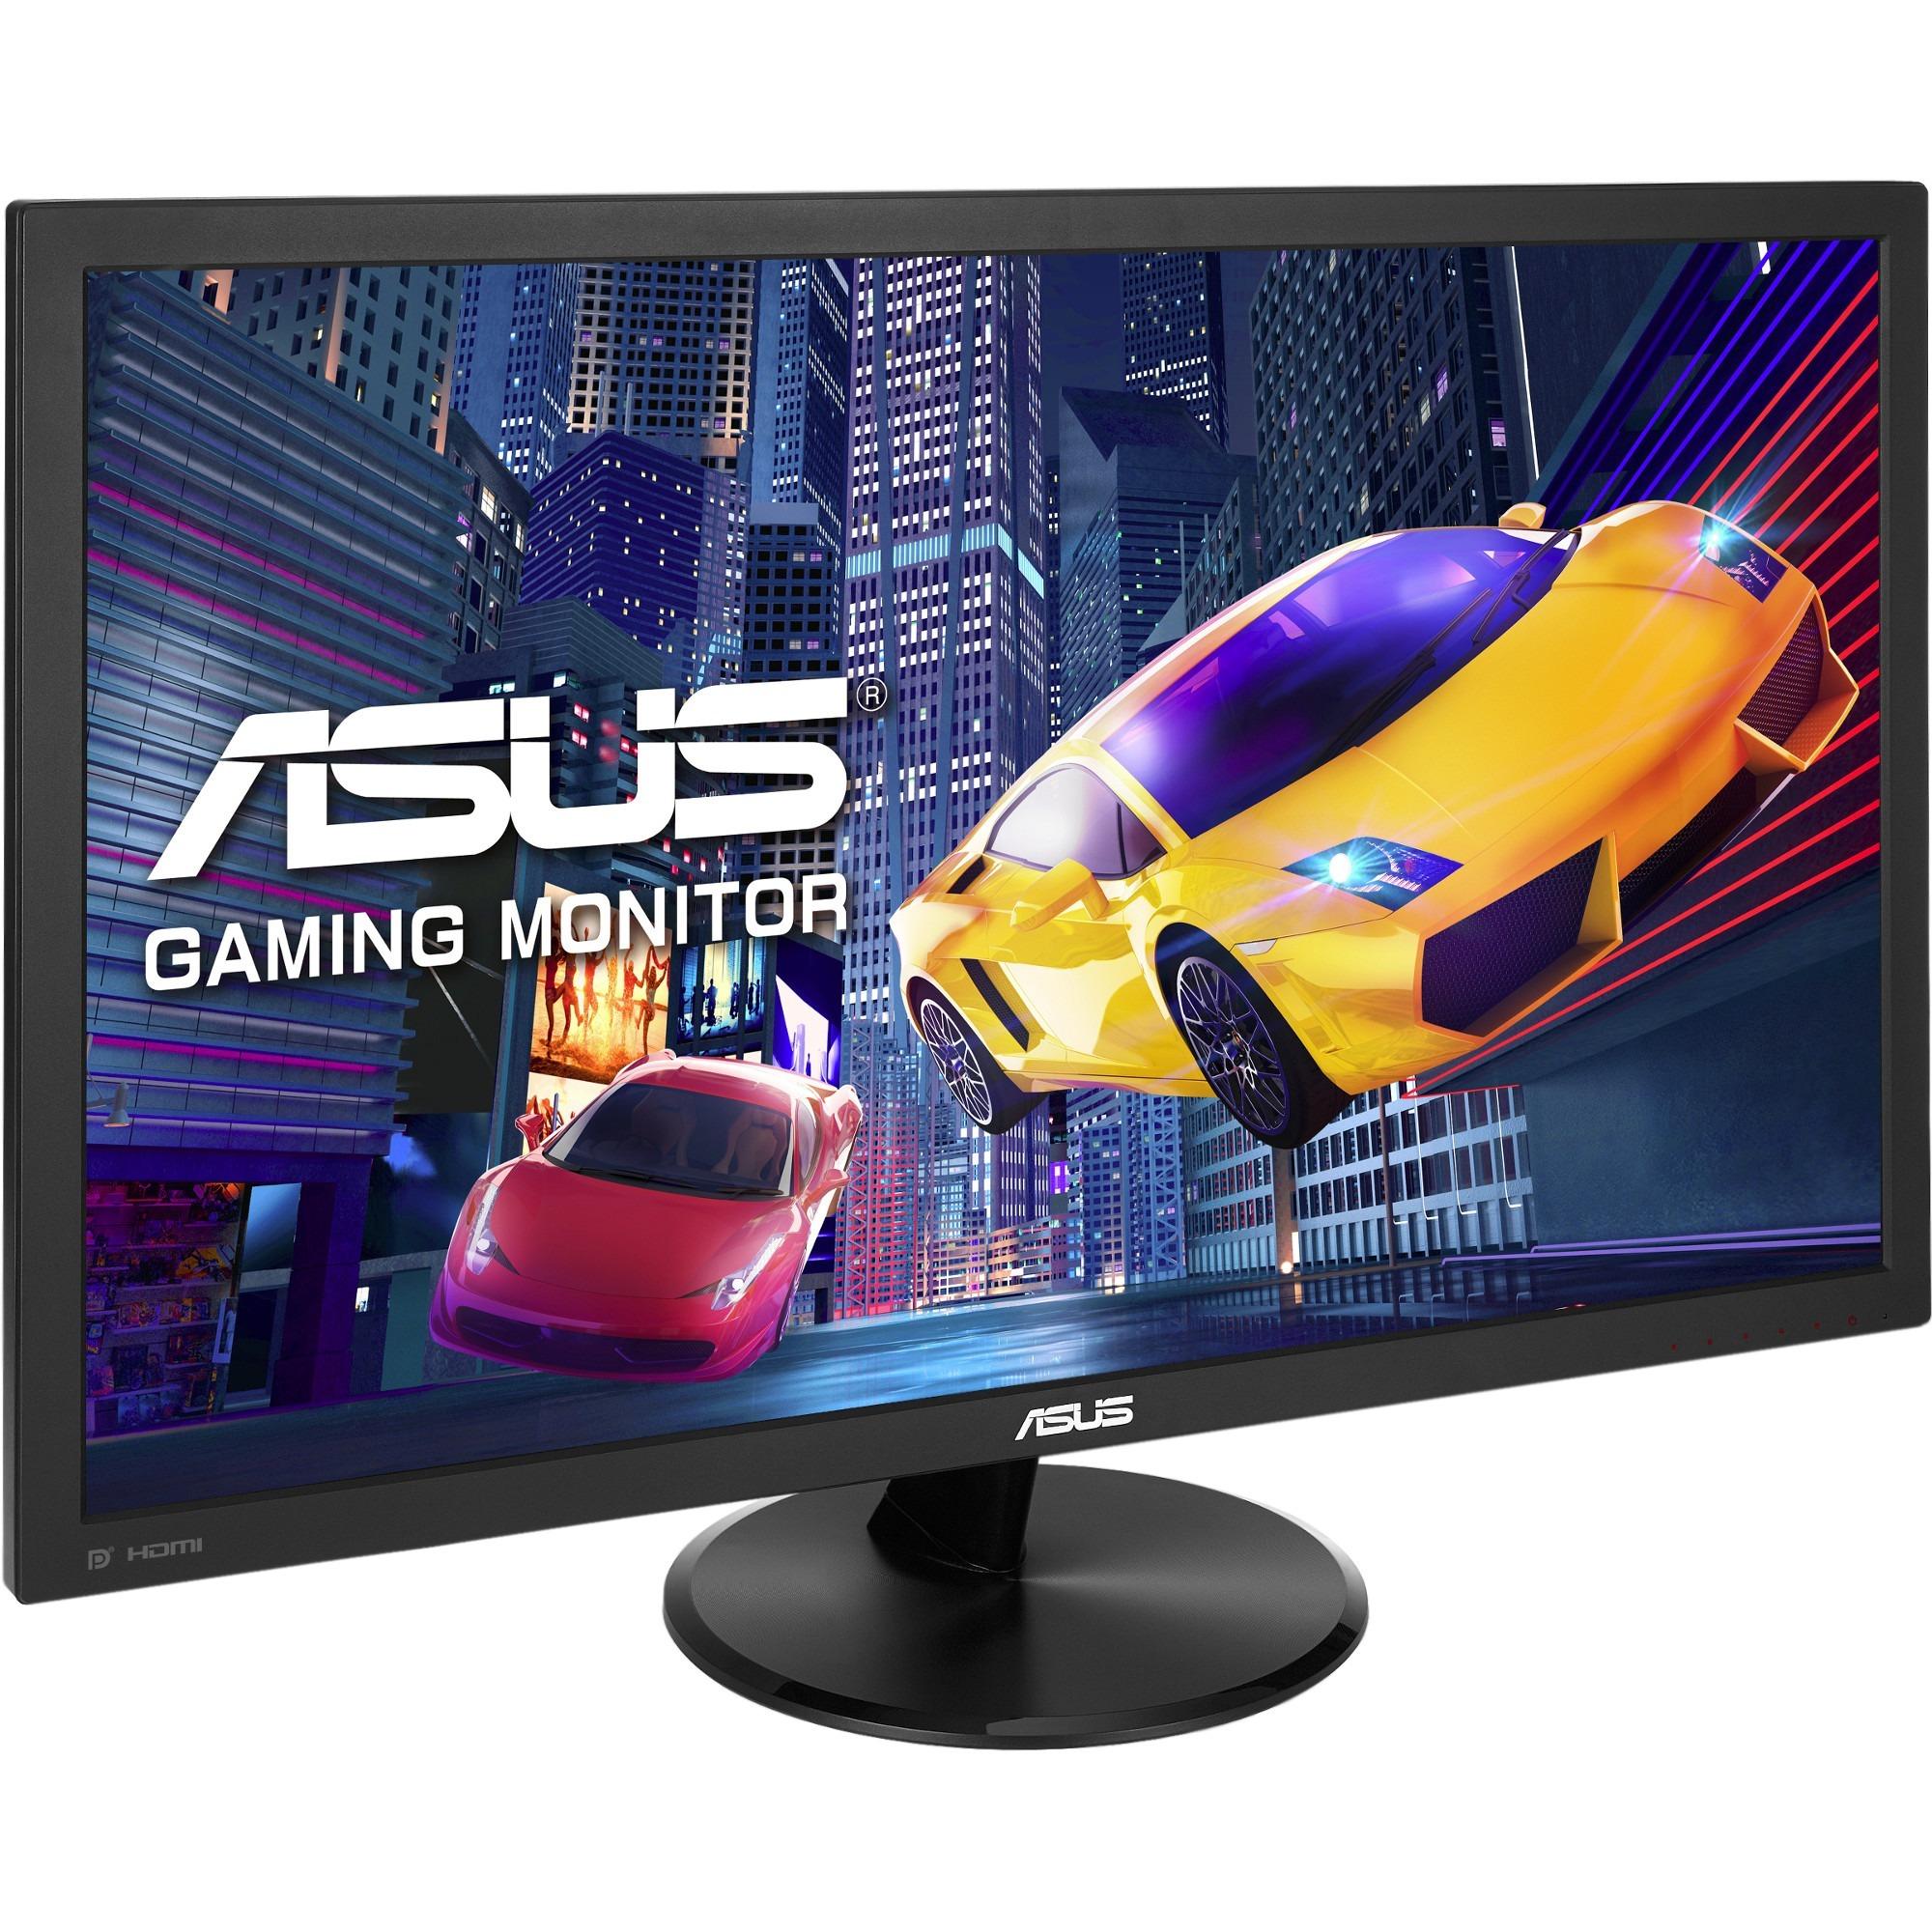 "Asus VP228QG 21.5"" Full HD LED Gaming LCD Monitor - 16:9 - Black_subImage_1"